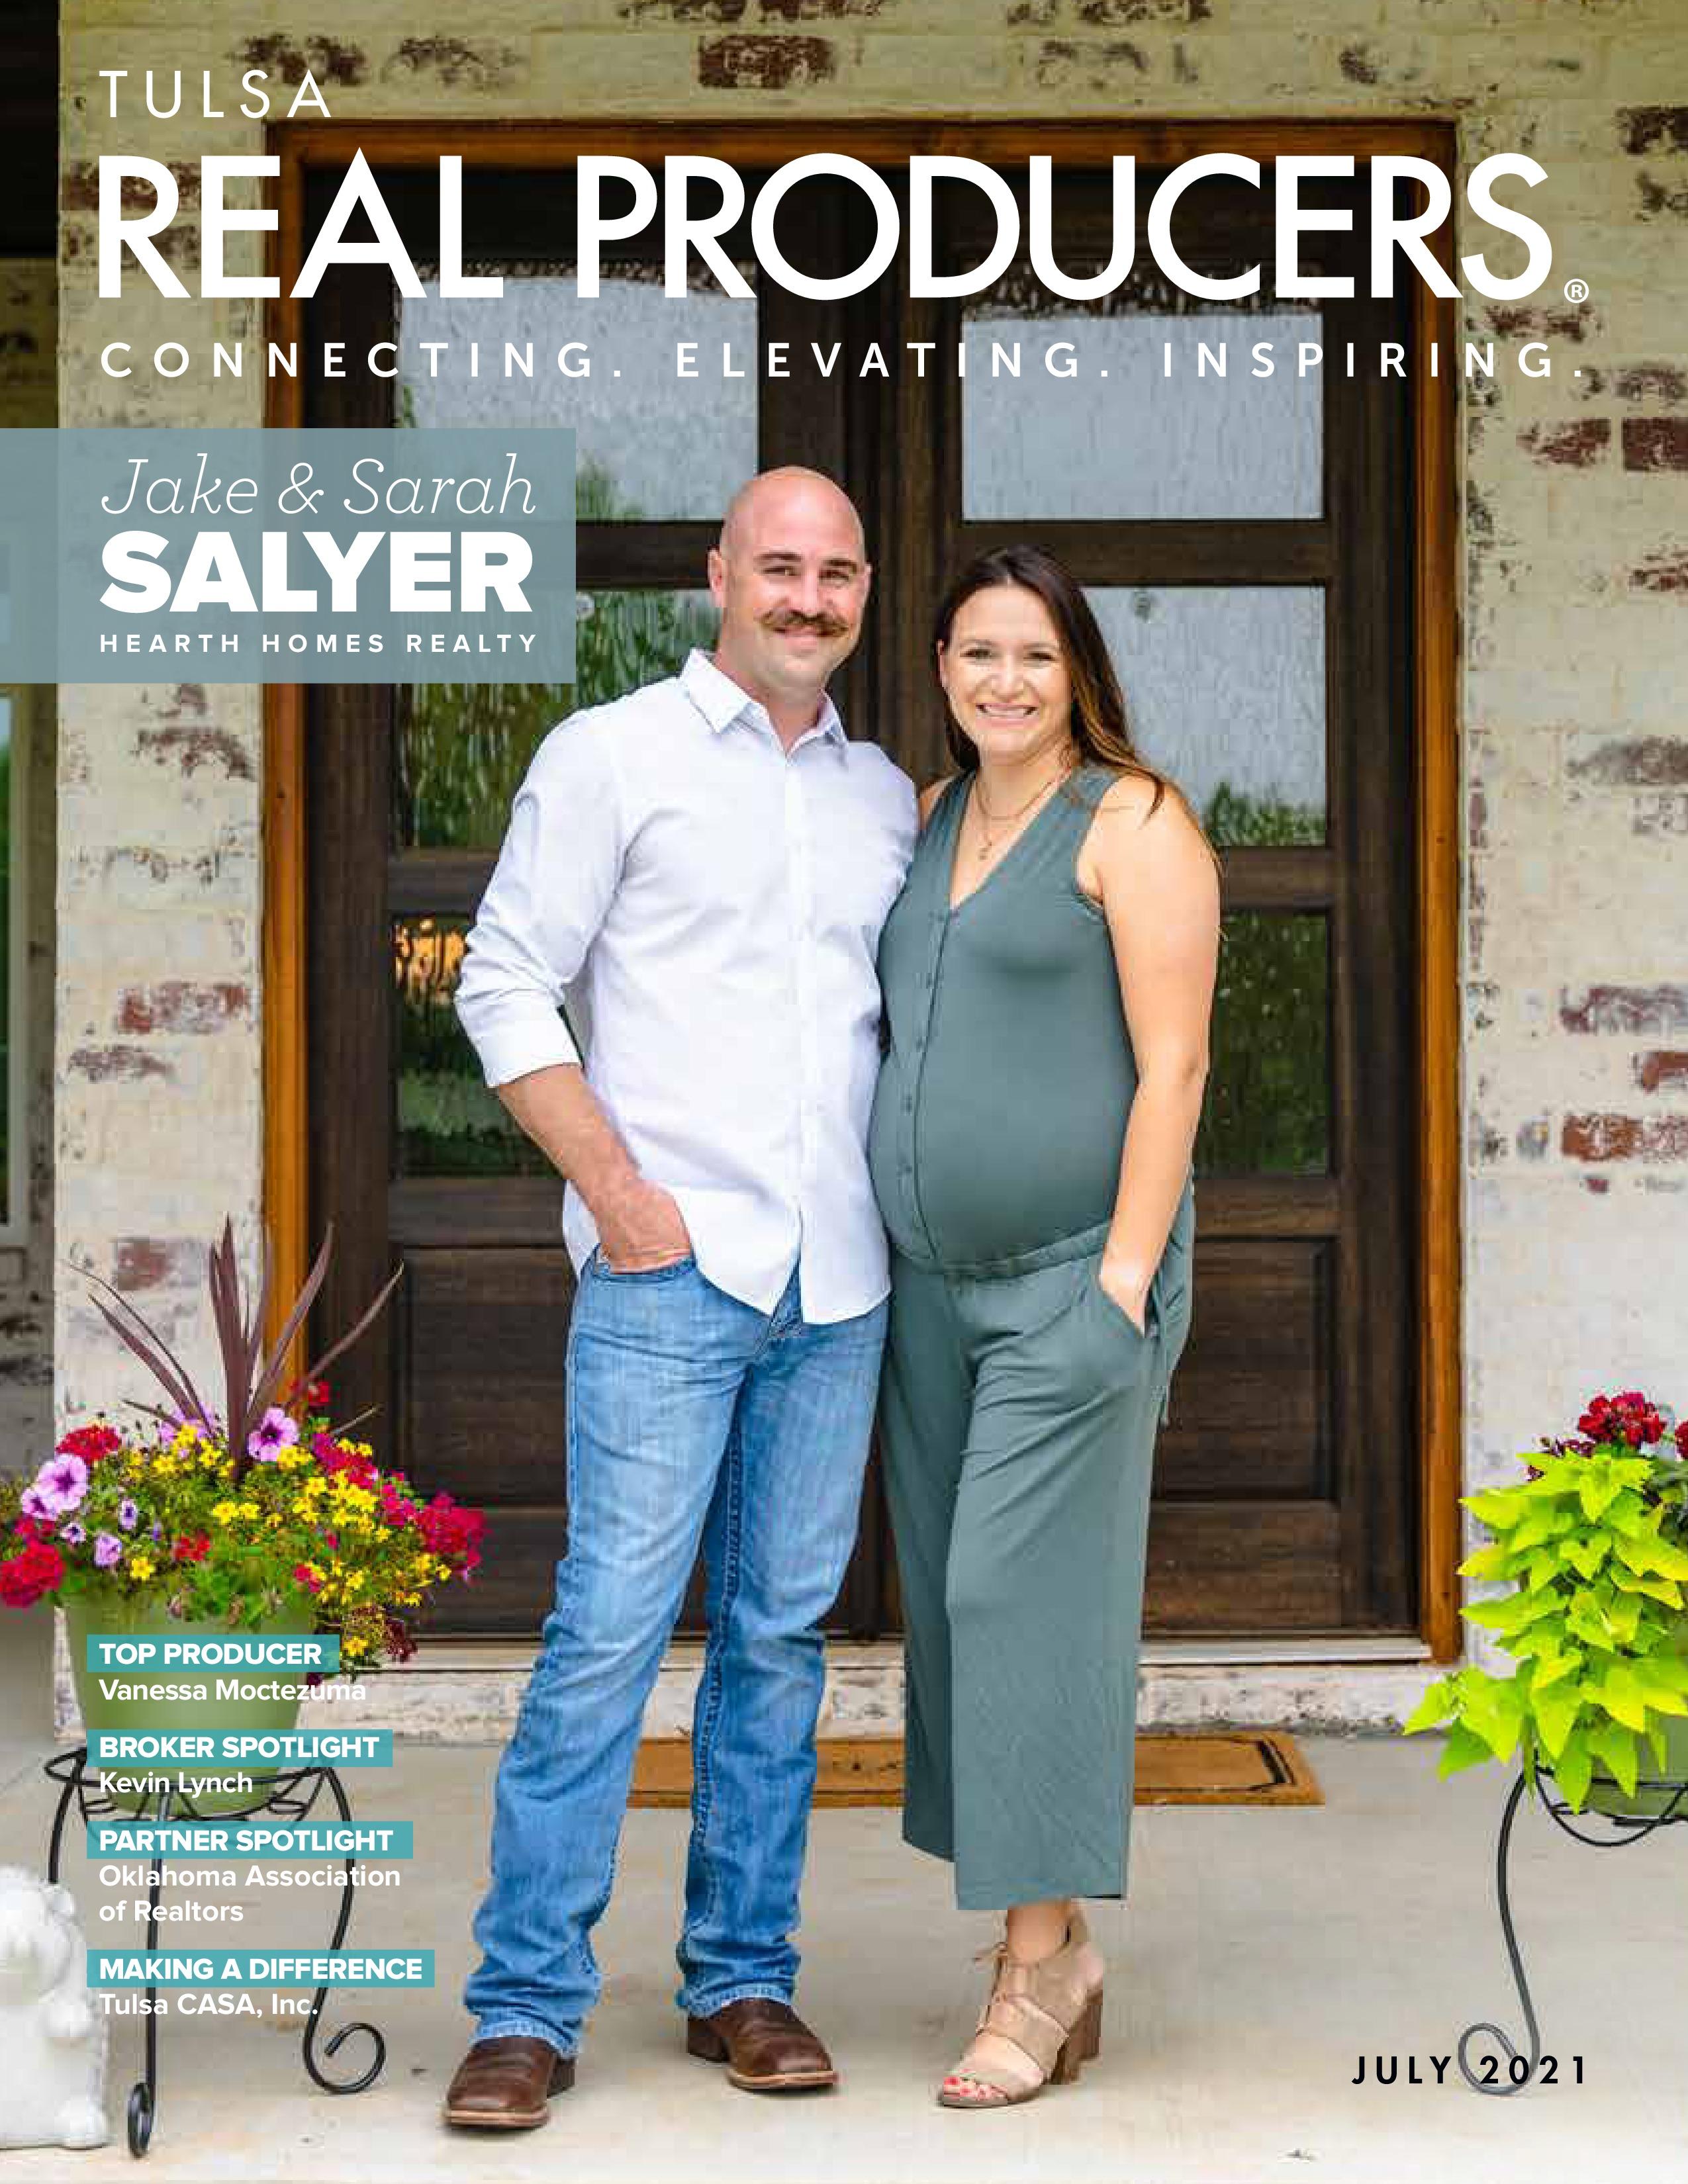 Tulsa Real Producers 2021-07-01